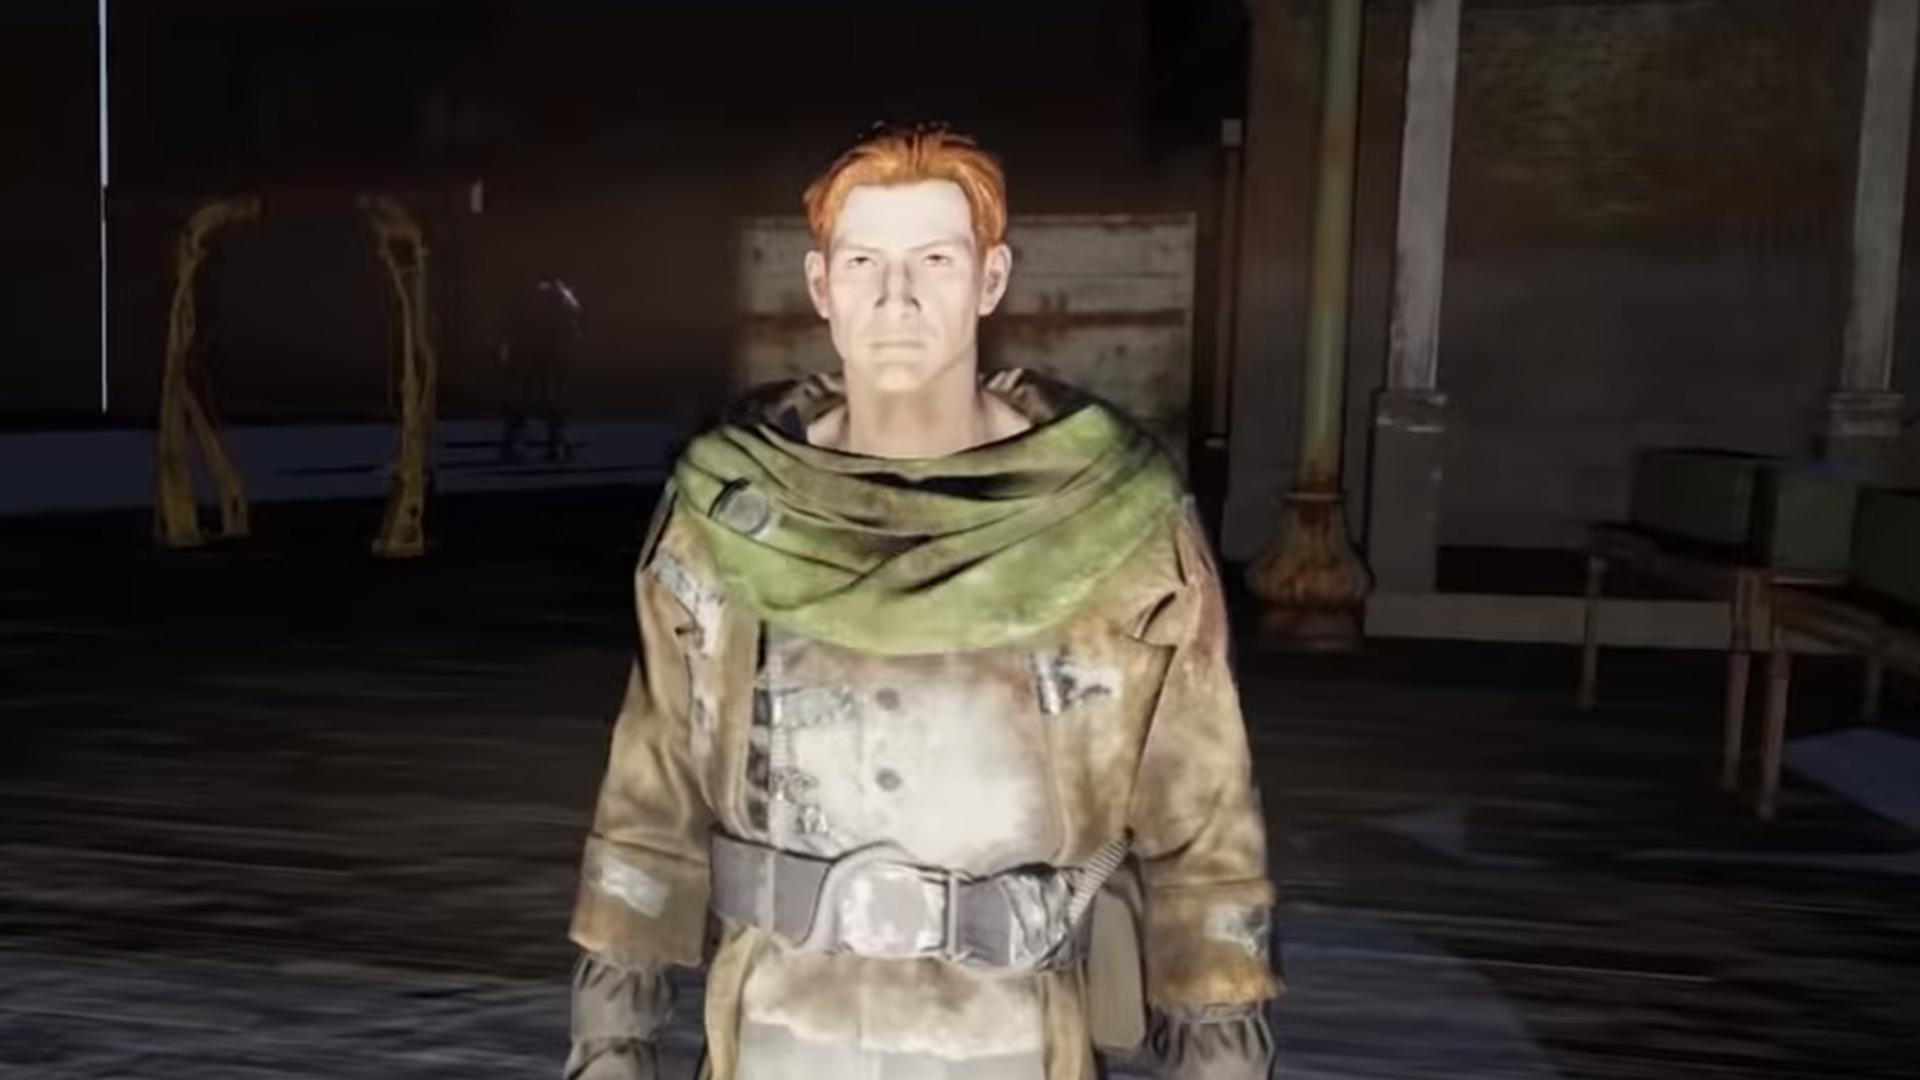 Meet Wooby Fallout 76s only human NPC PCGamesN